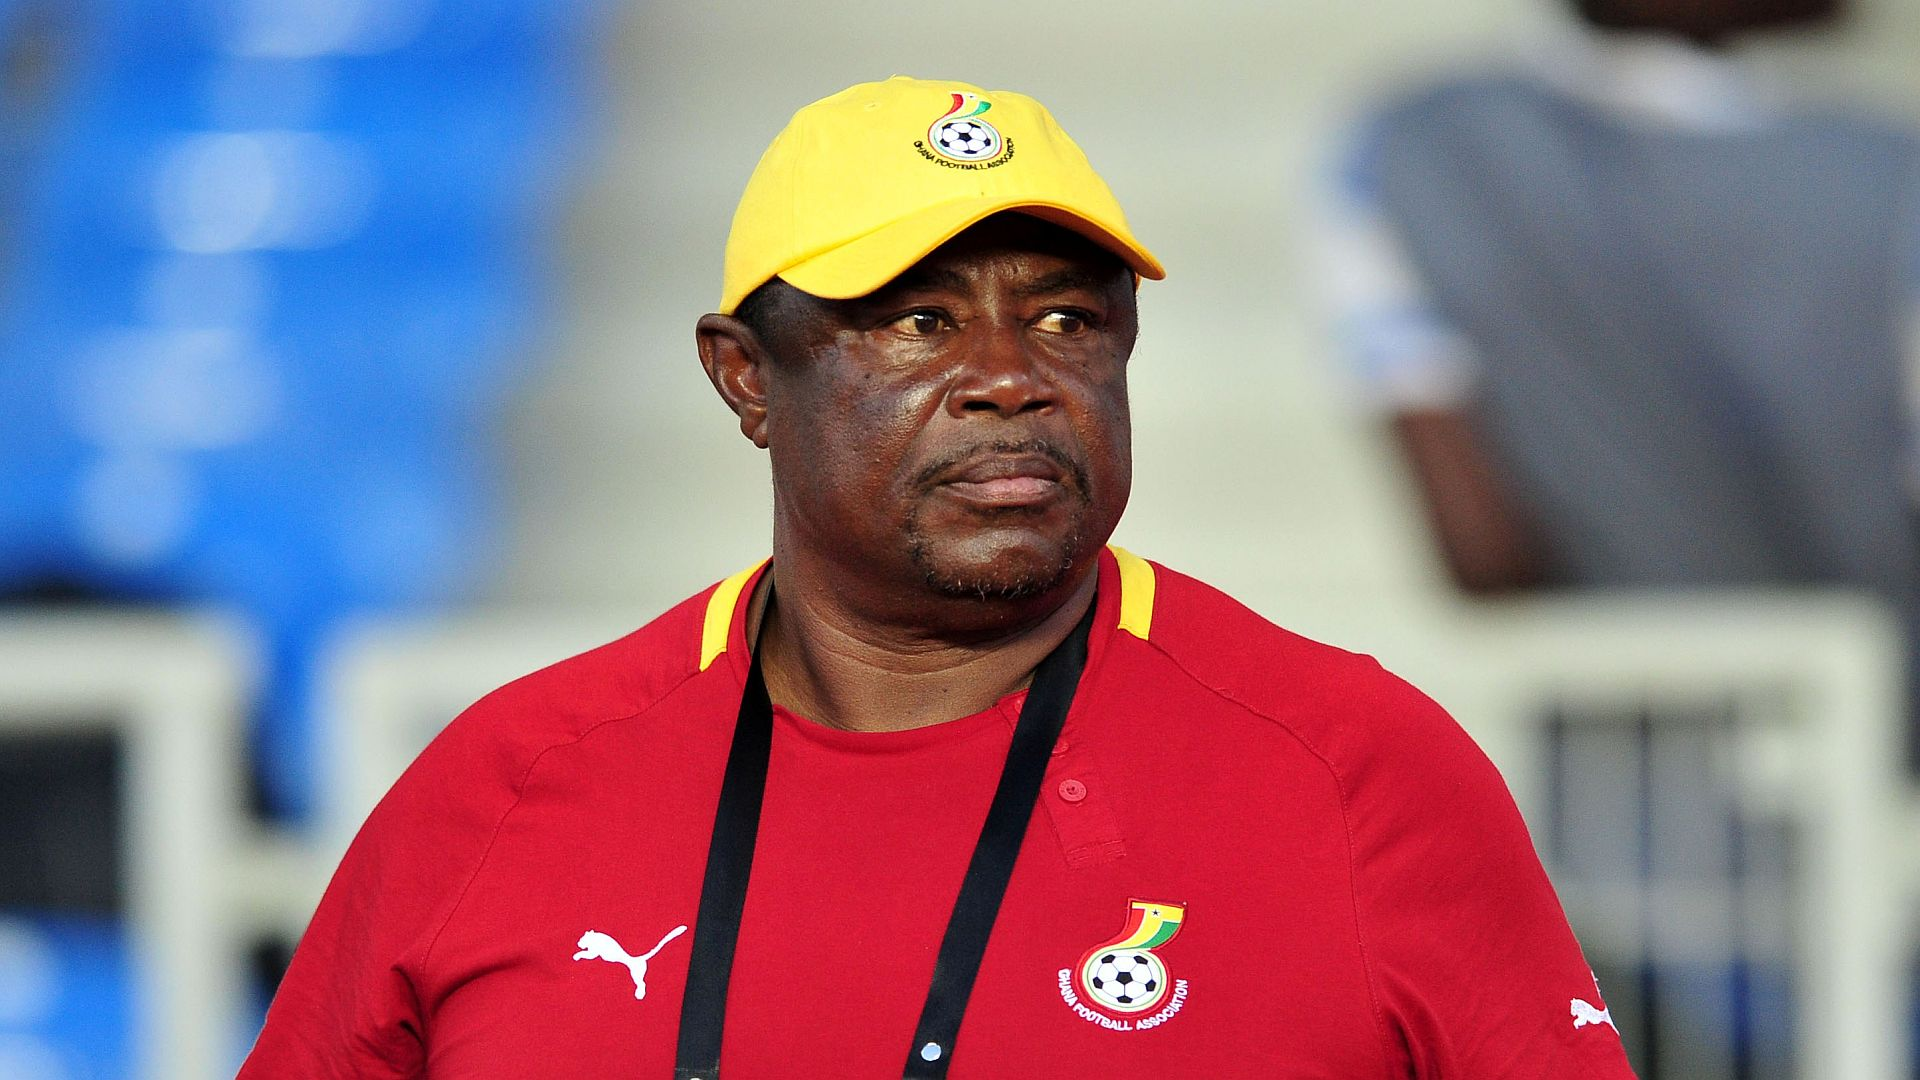 Fan View: Salifu's late inclusion provokes more backlash after Ghana make U23 squad U-turn